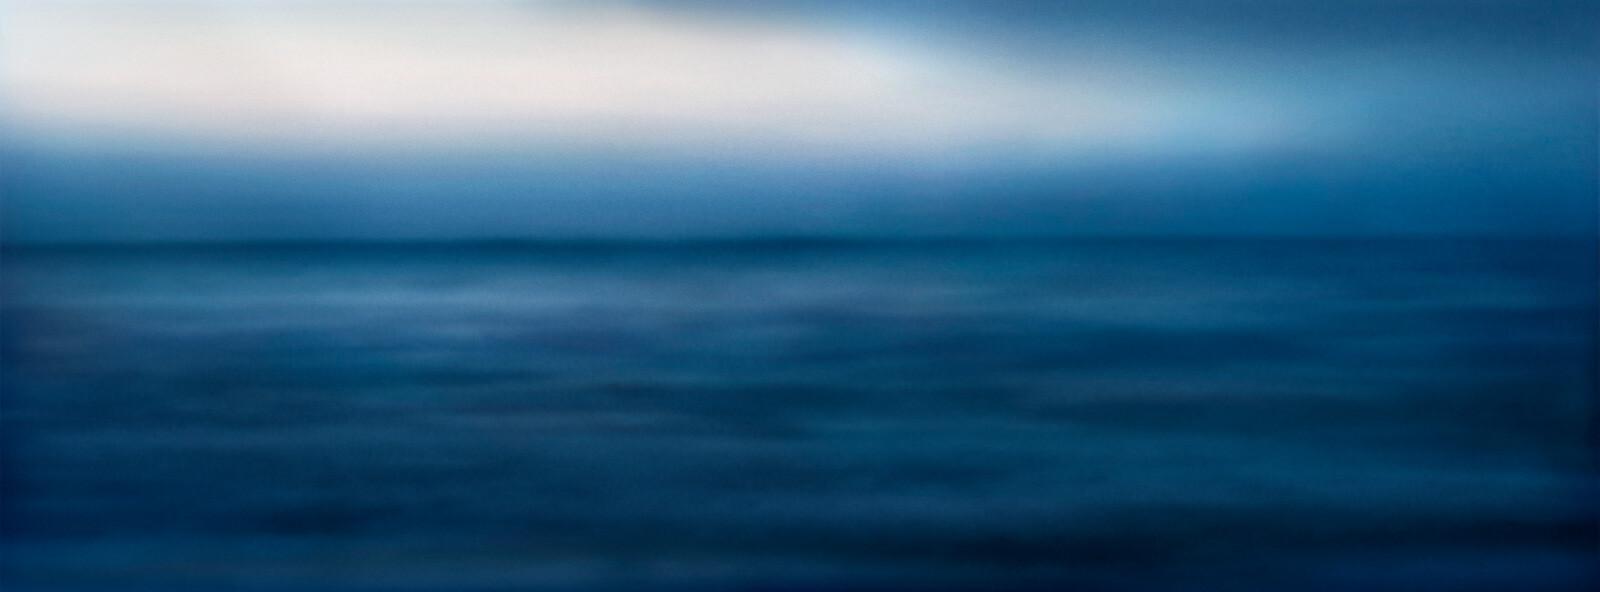 Like a Breath in Light #1 - Marja Pirilä